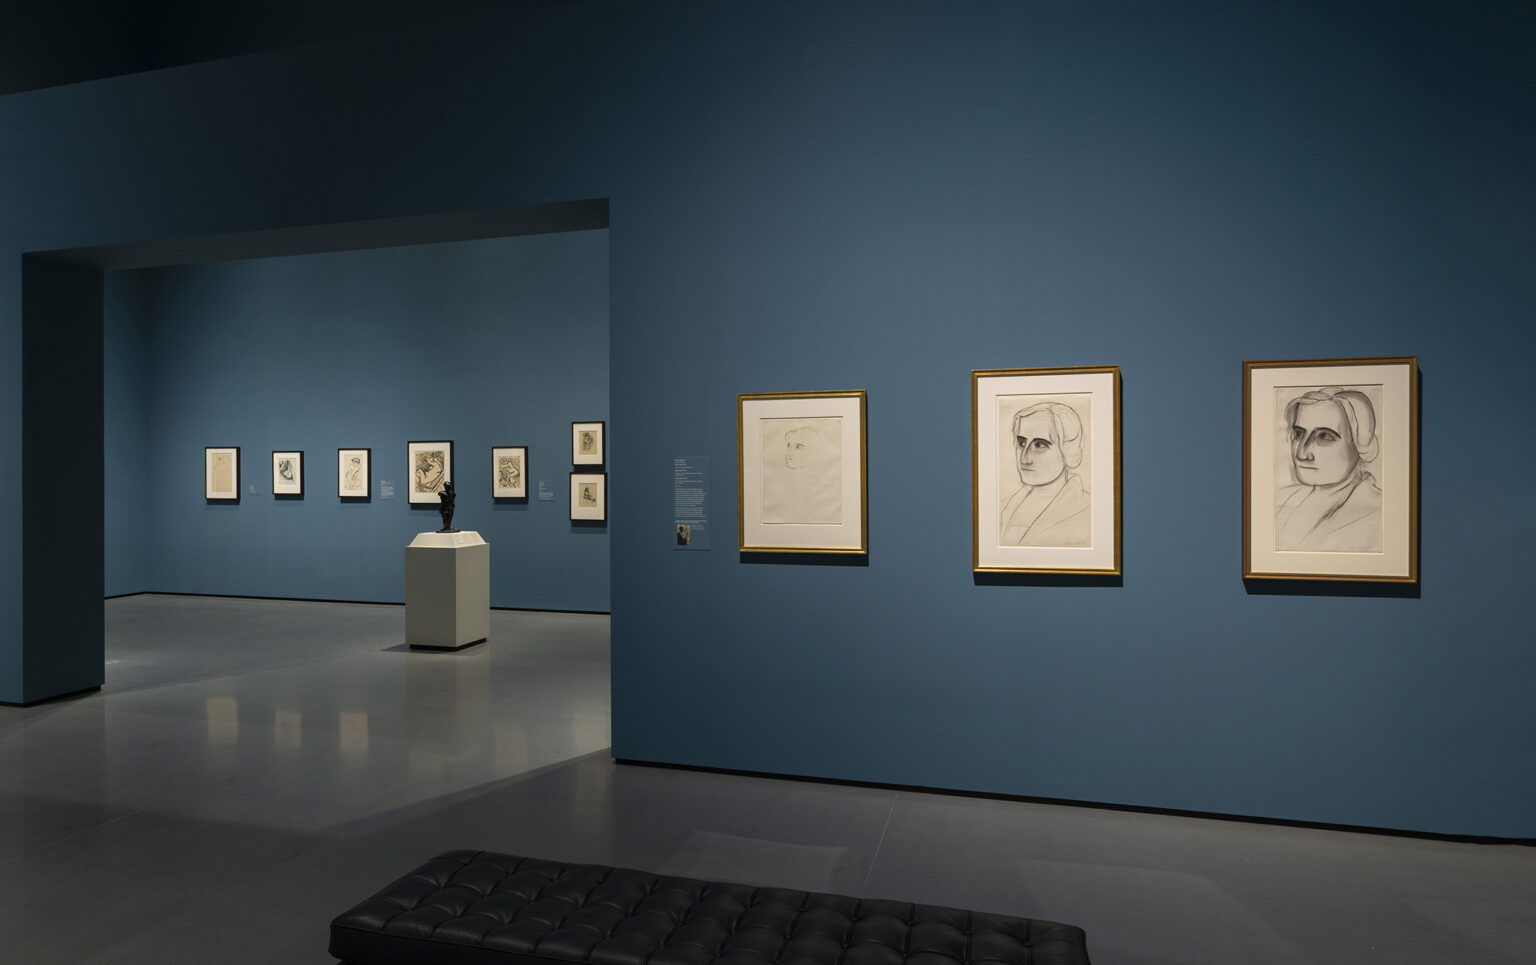 Installation view, A Modern Influence: Henri Matisse, Etta Cone, and Baltimore